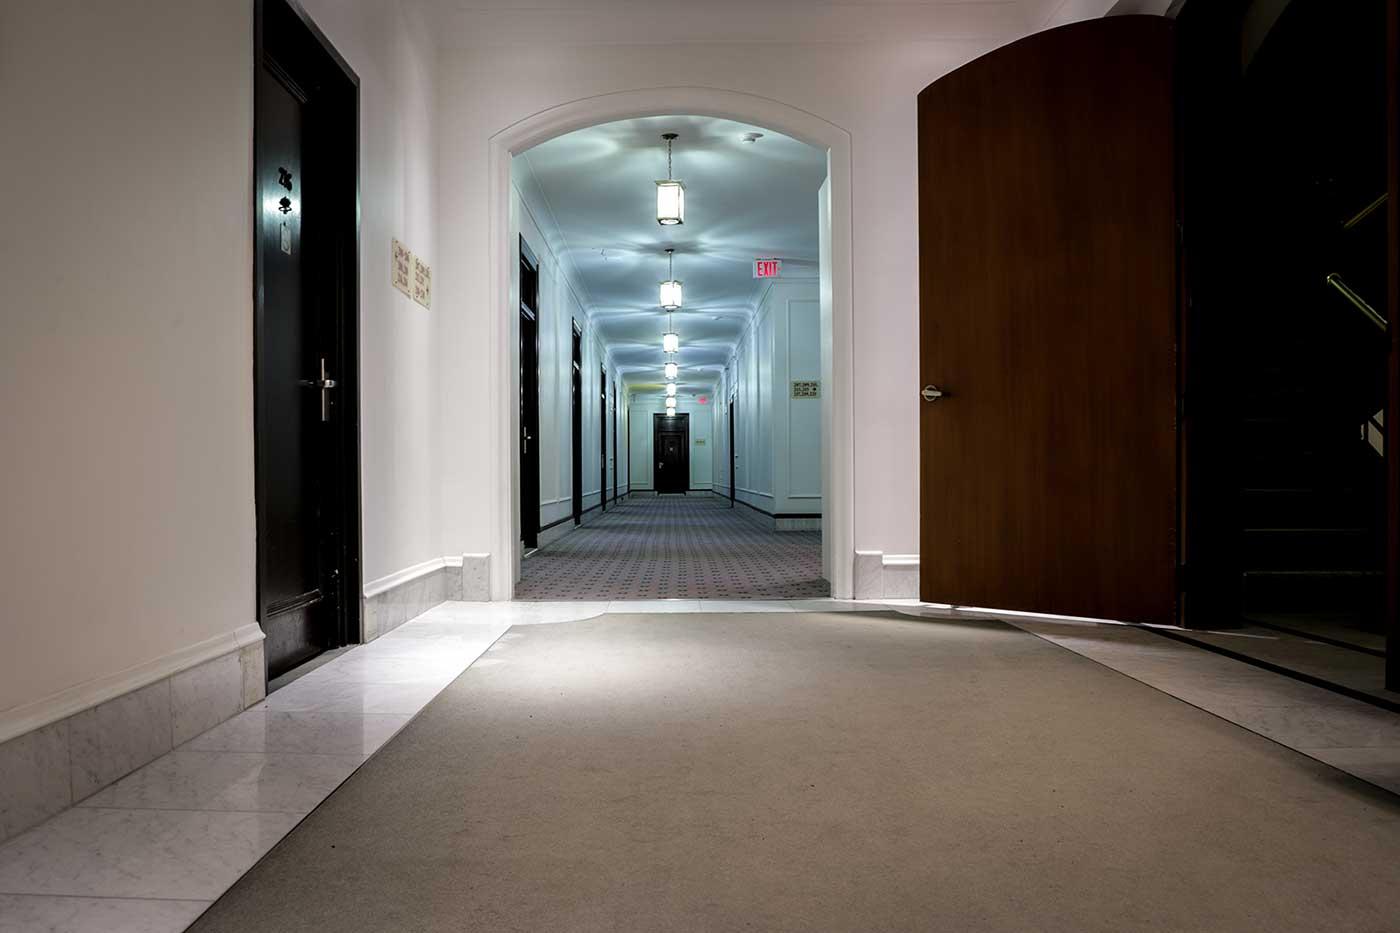 Exploring the corridors of Winnipeg's Fort Garry Hotel.